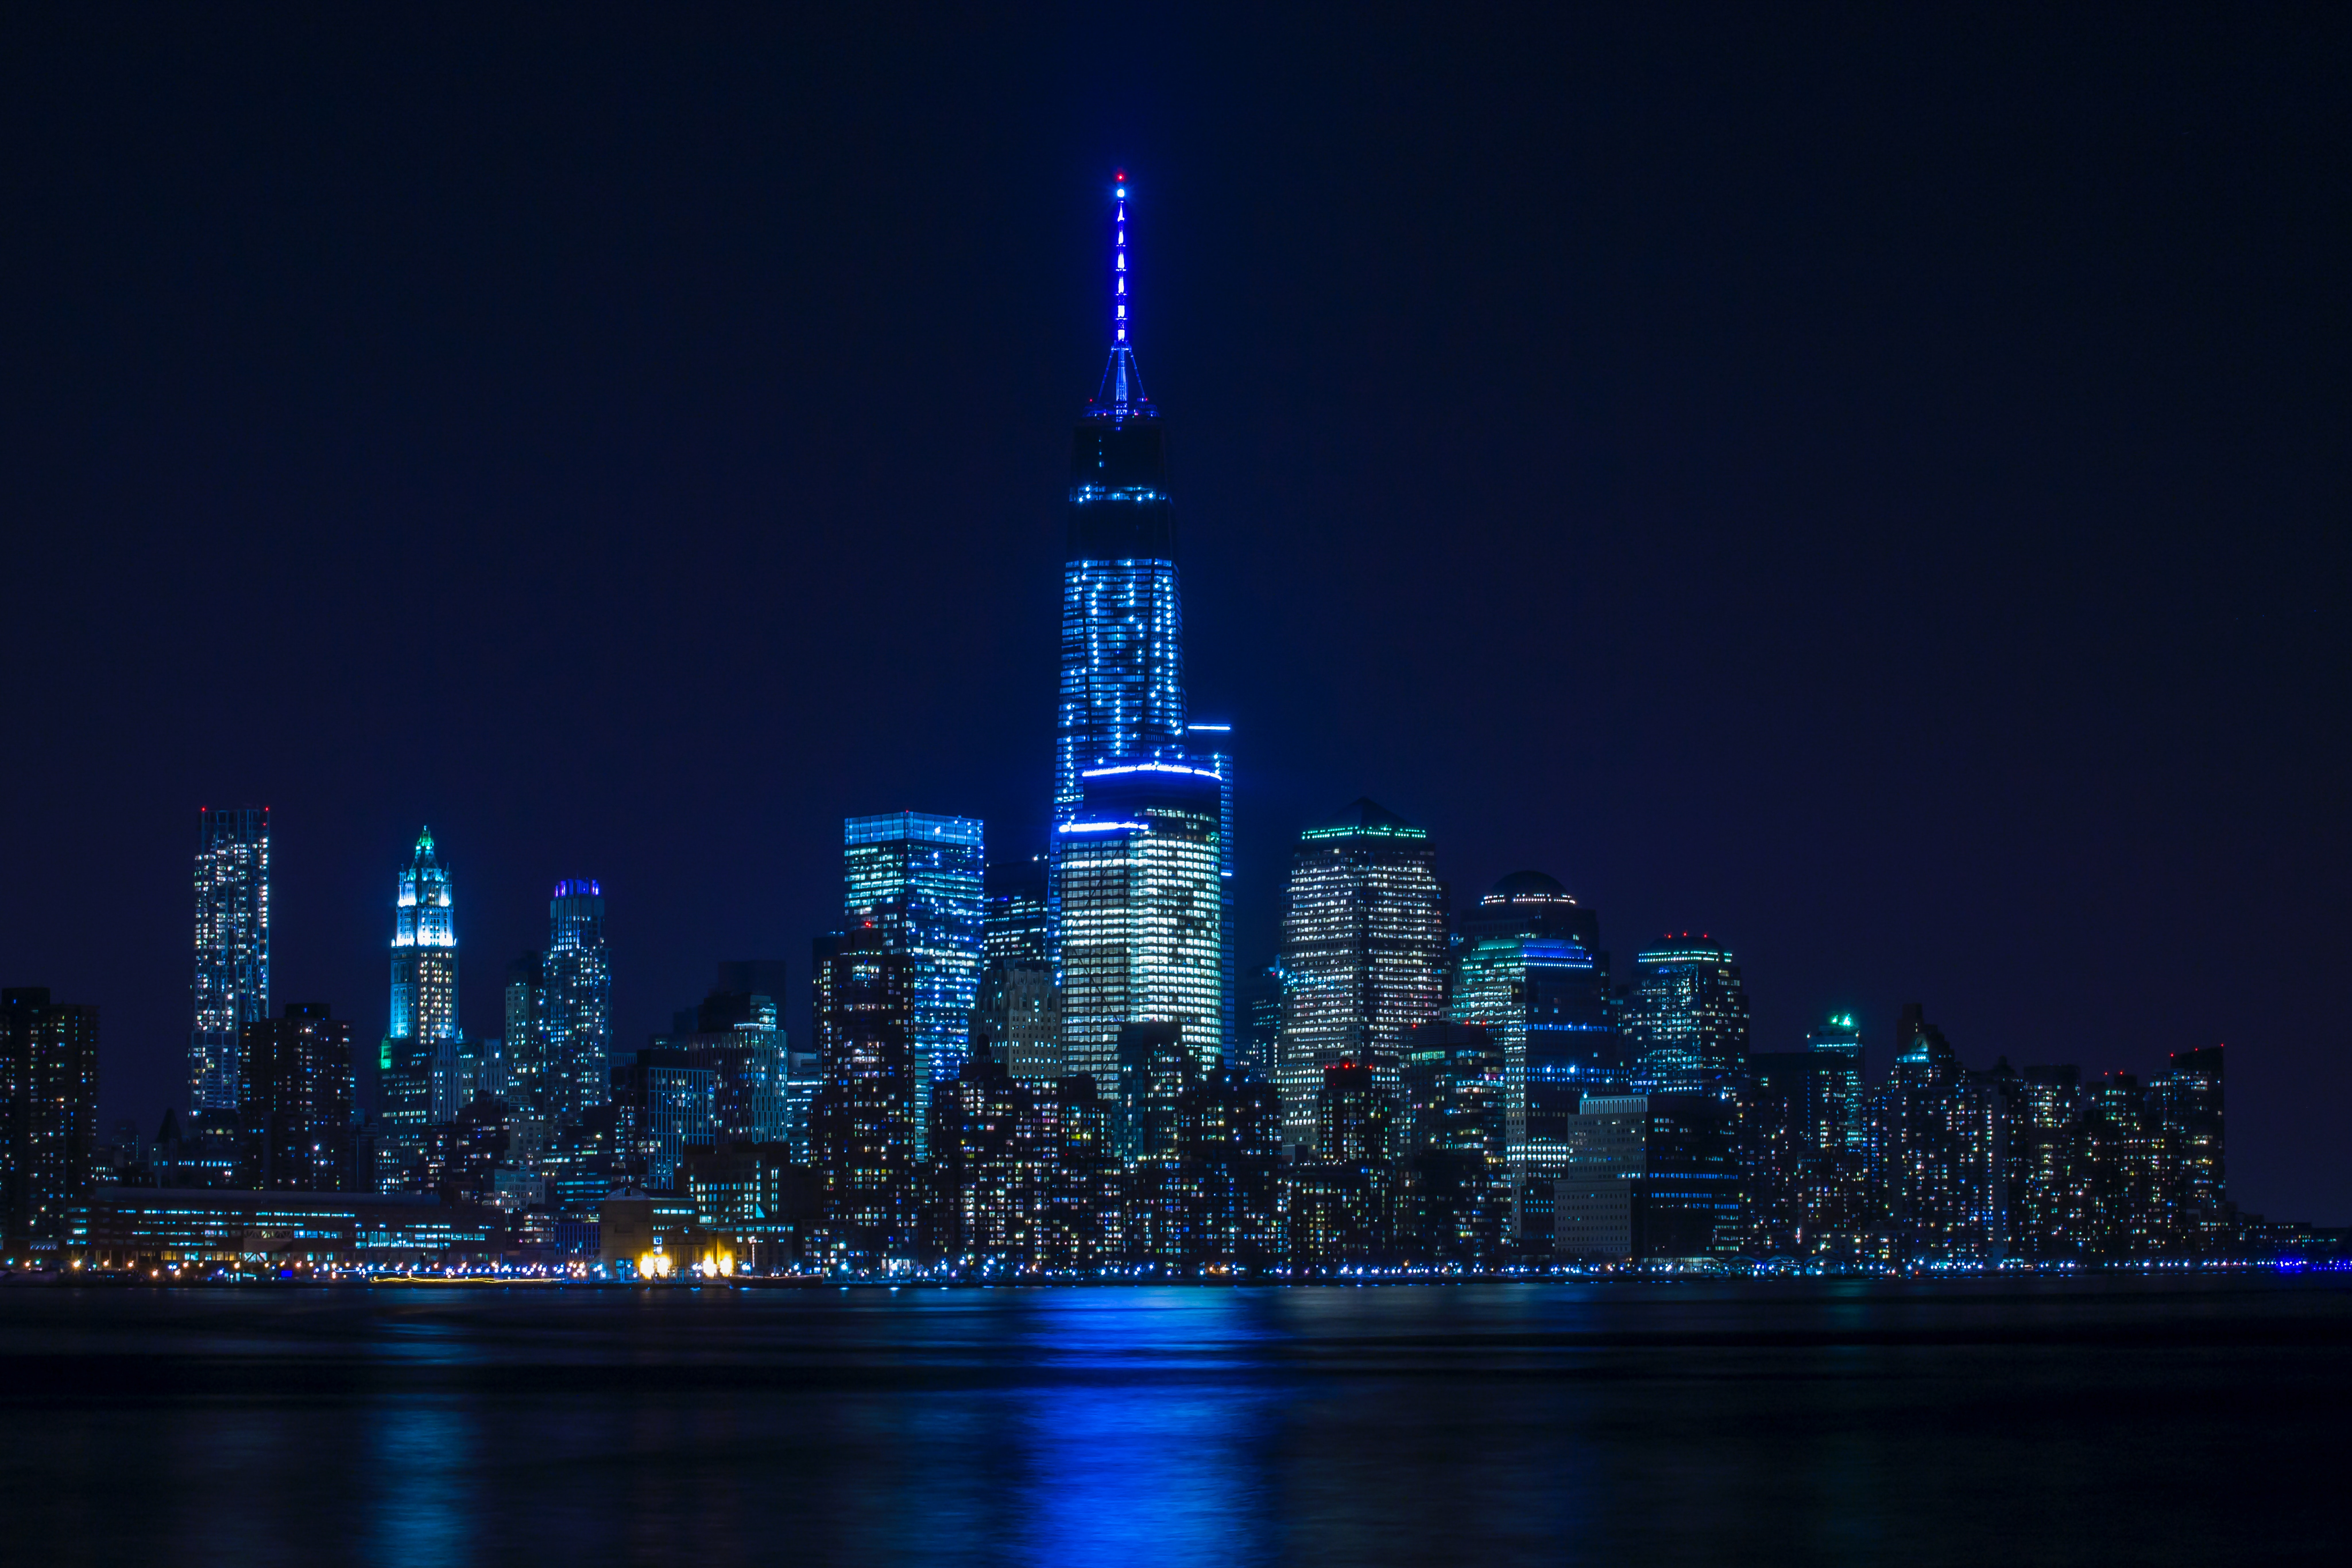 Blue Light Buildings Architecture 8k, HD World, 4k ...